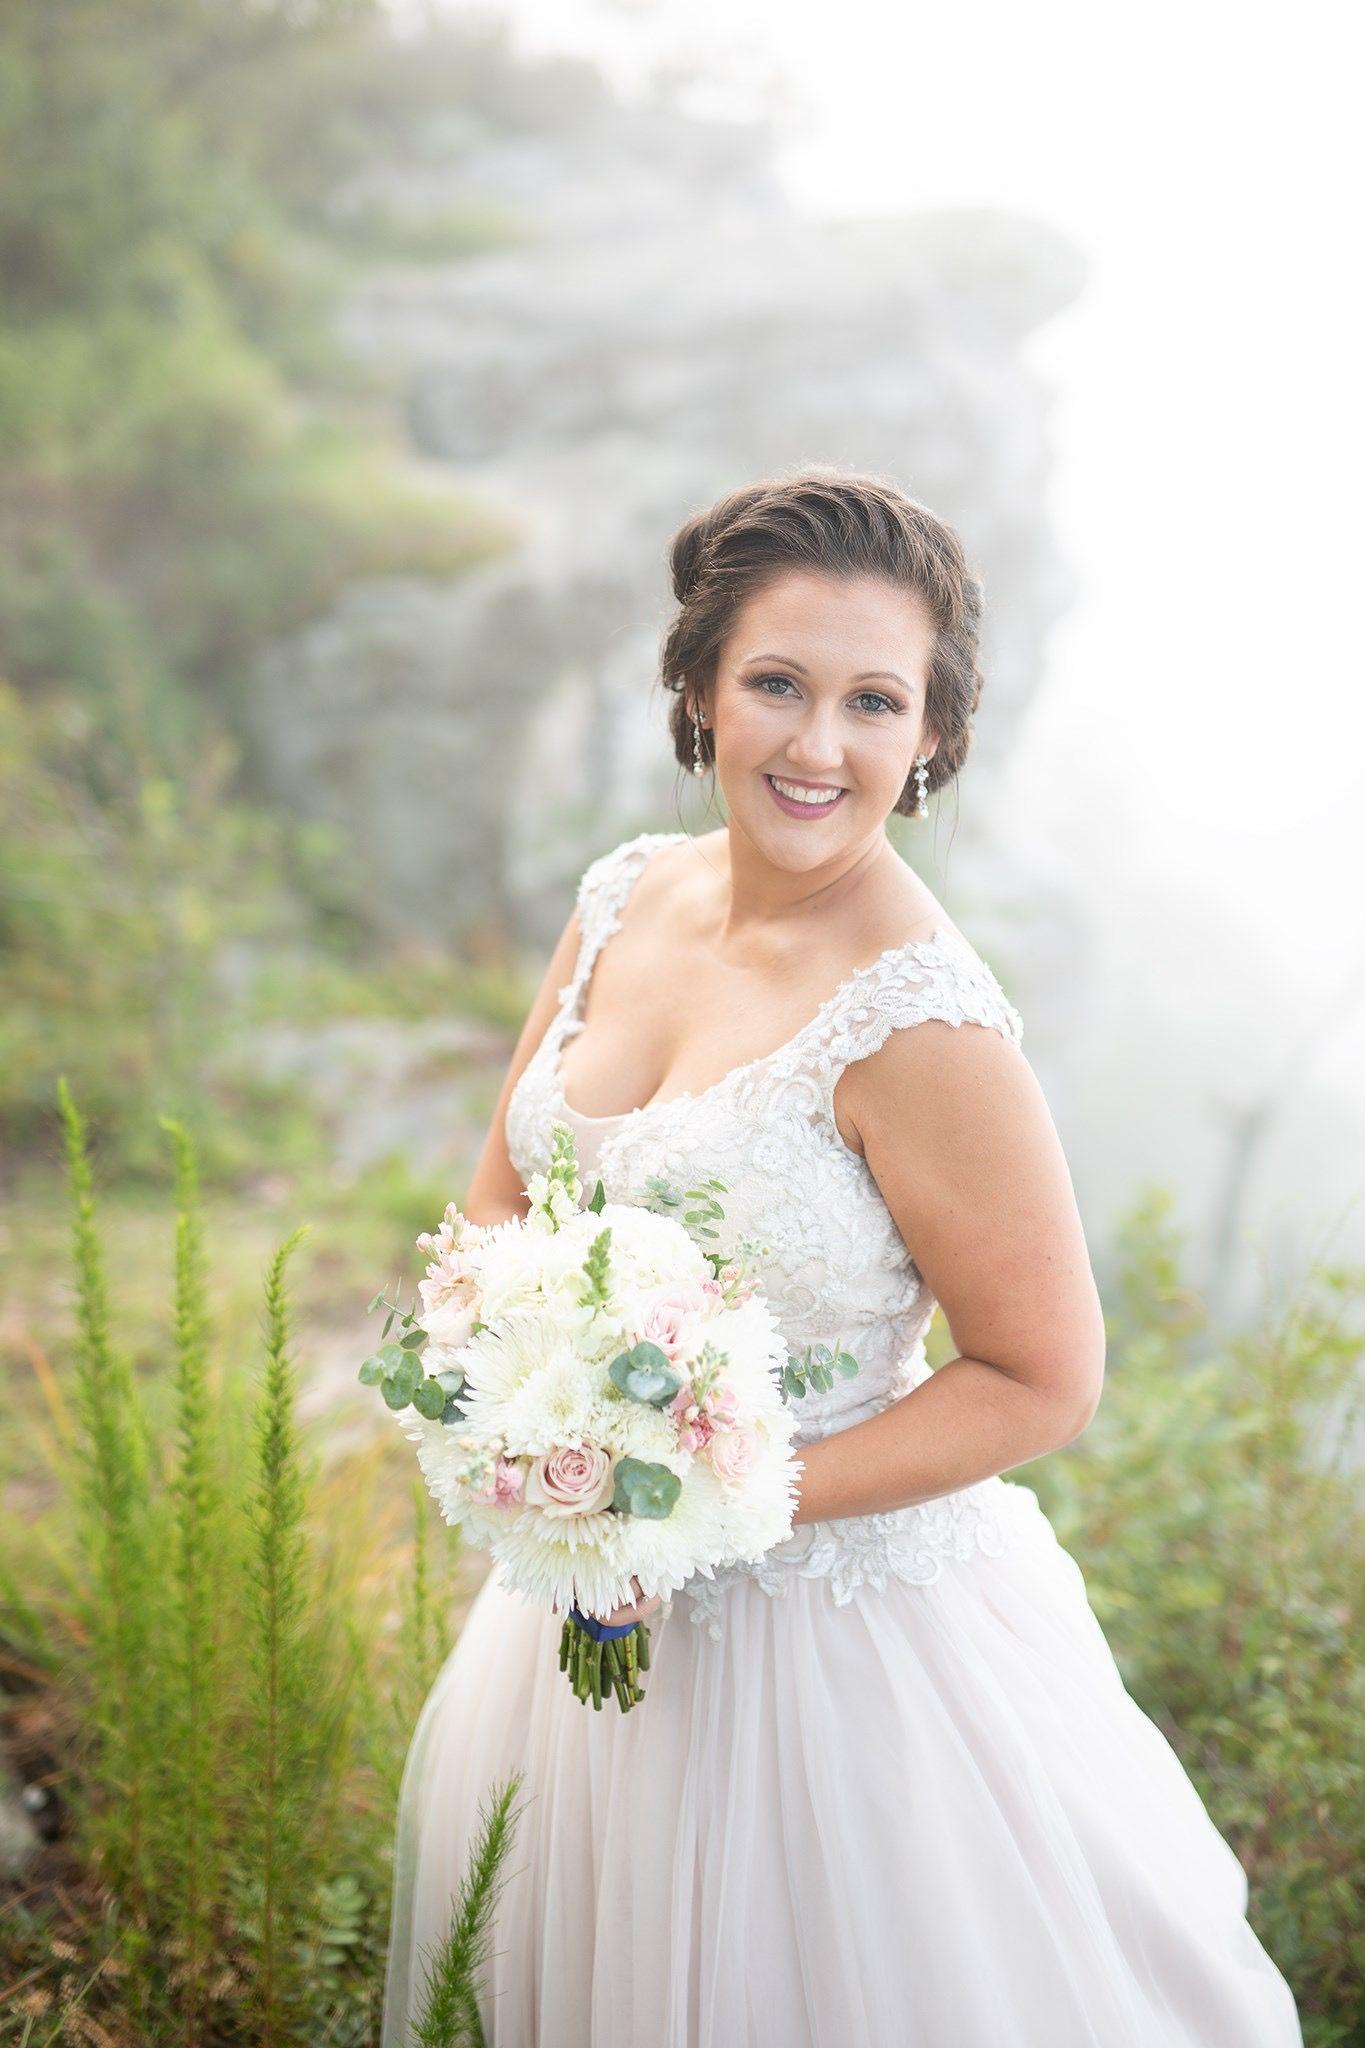 46+ Wedding venues pilot mountain nc ideas